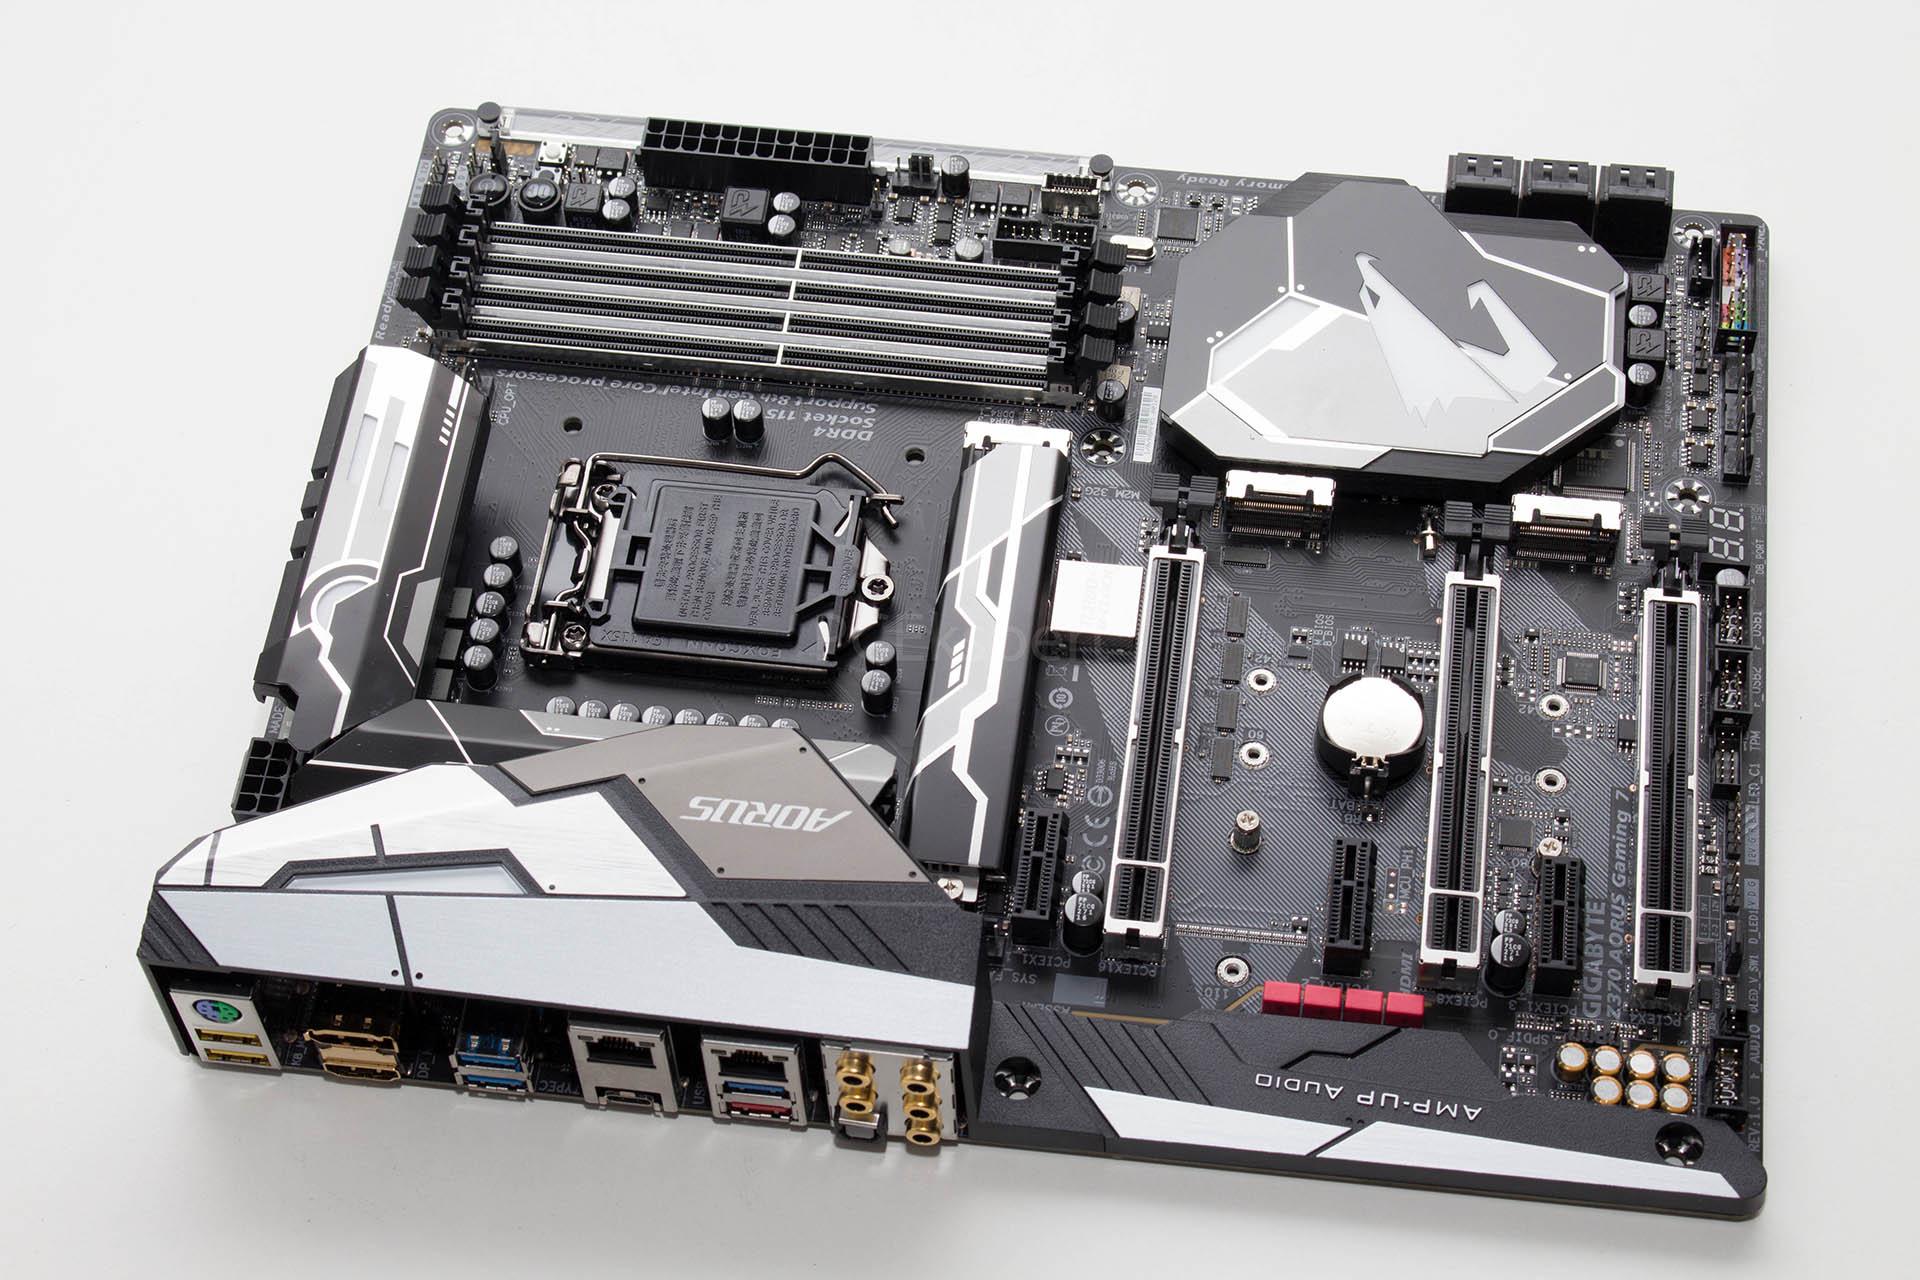 PC Ekspert - Hardware EZine - Gigabyte Z370 Aorus Gaming 7 recenzija